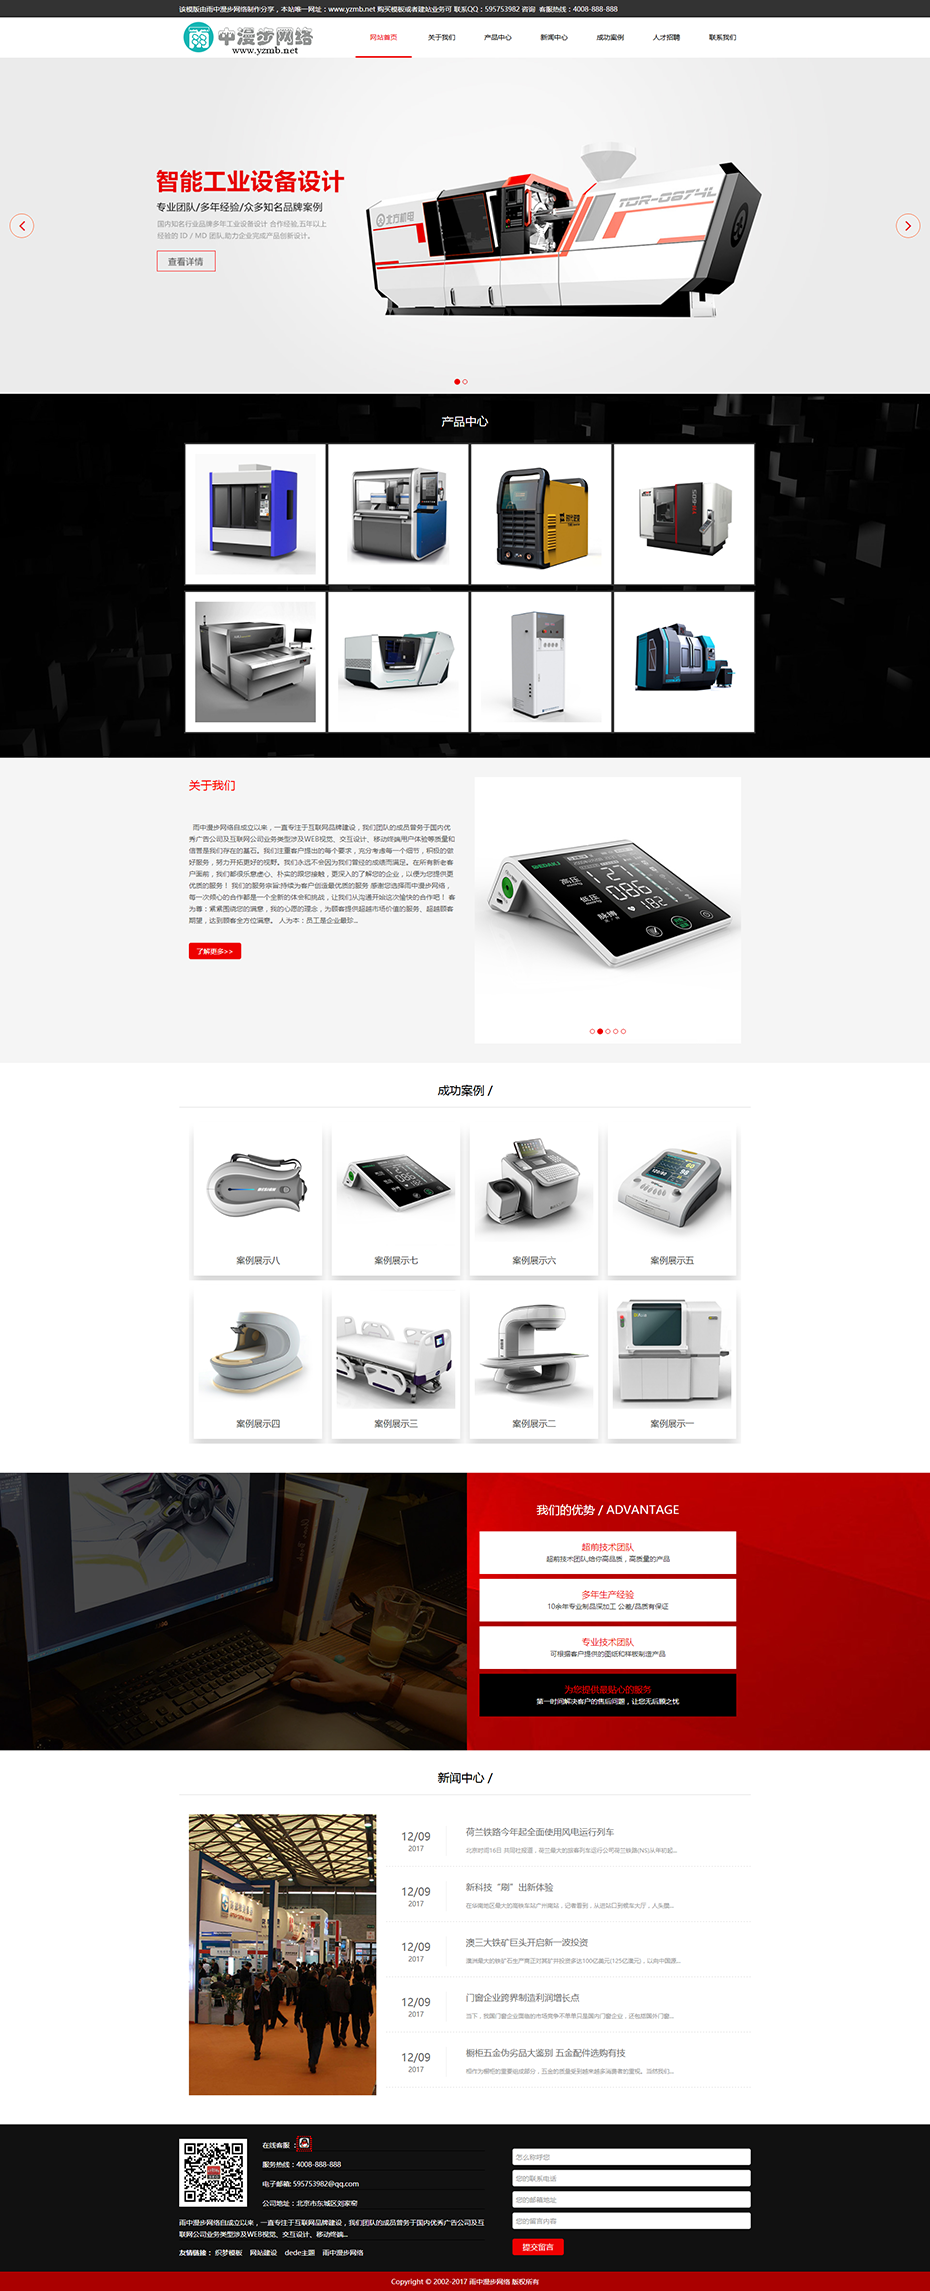 dede主题模板-(自适应手机版)响应式智能工业设备设计类企业织梦模板 第2张